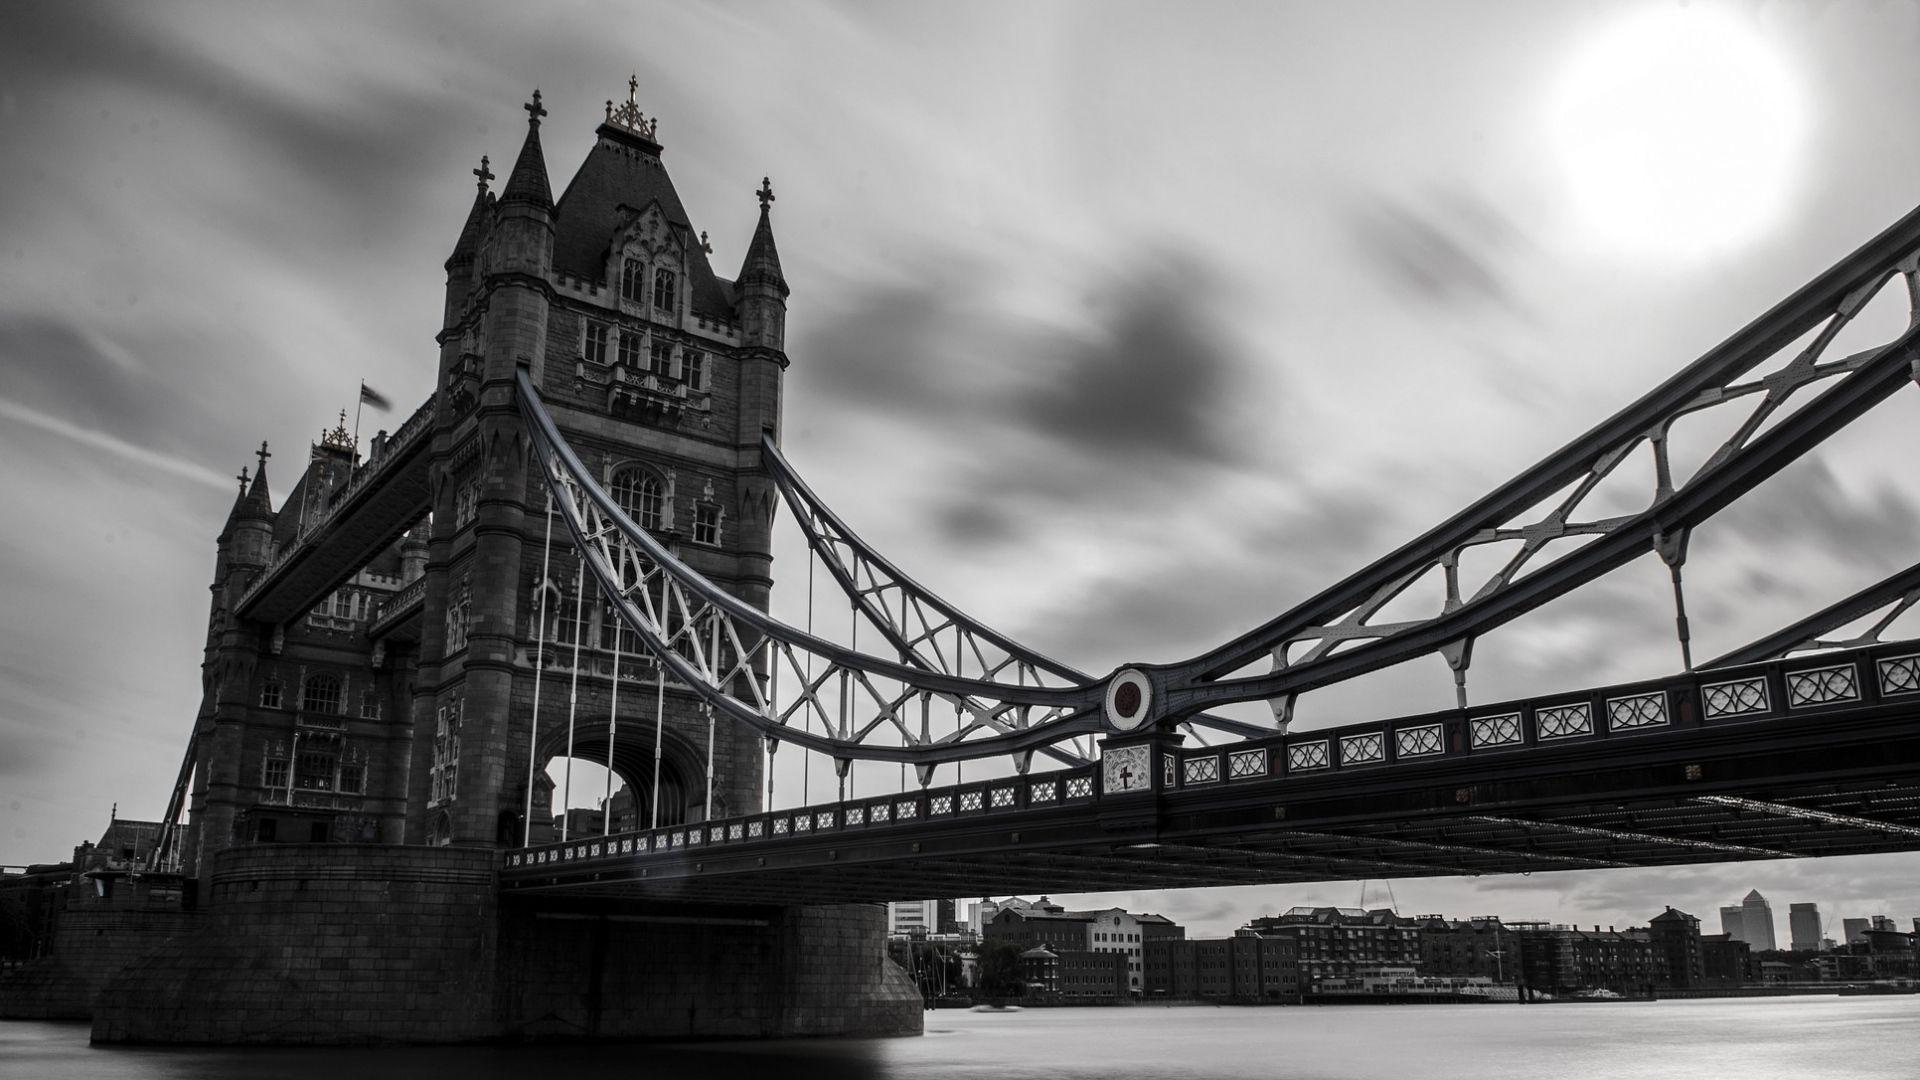 black and white london wallpaper 1920 1080 london black and white